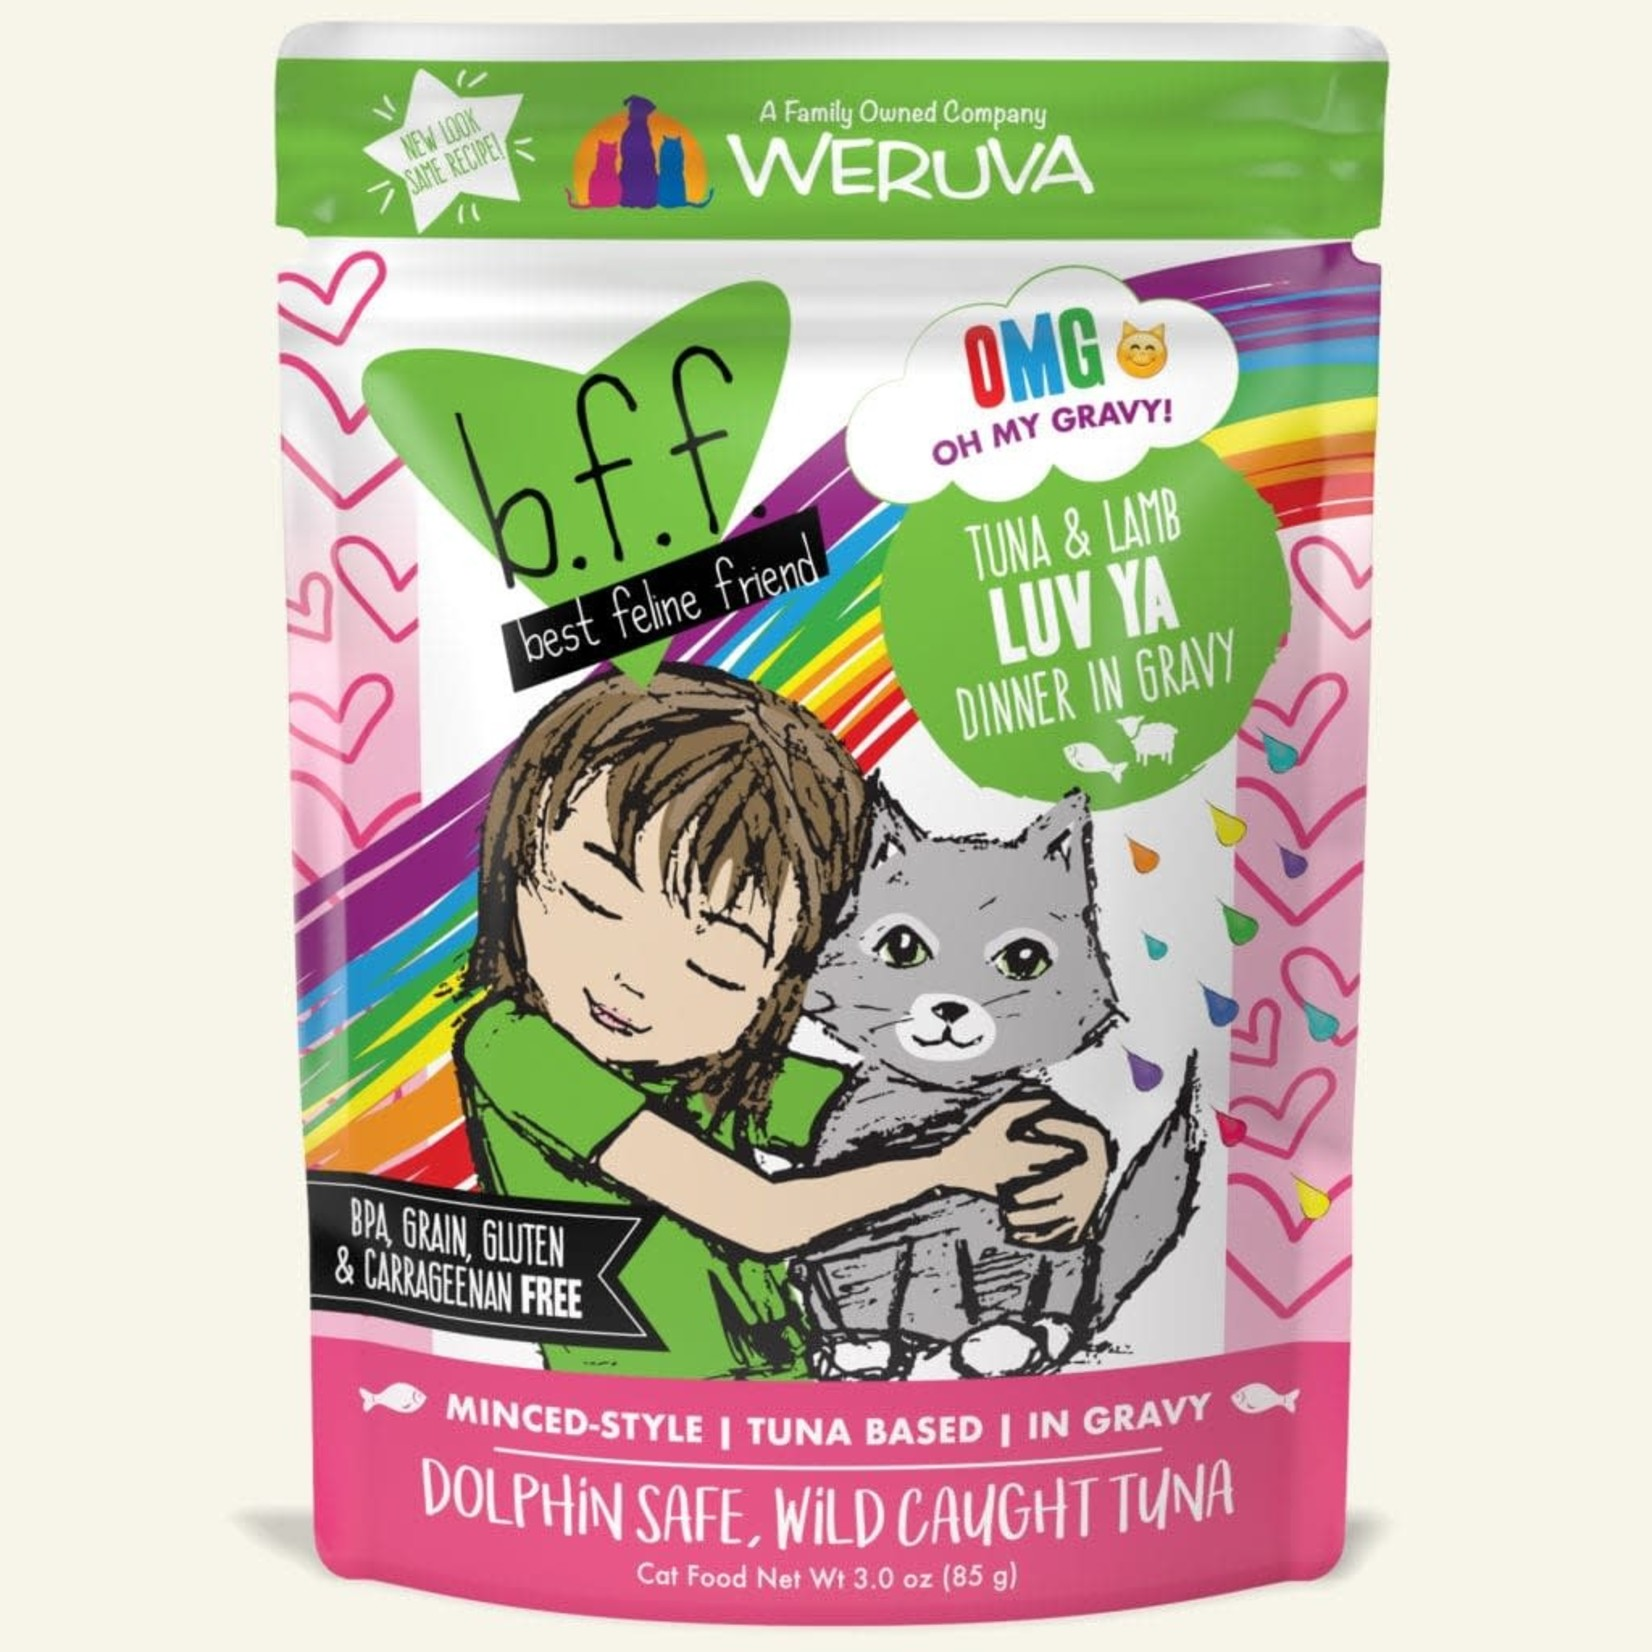 Weruva BFF OMG Cat Tuna & Lamb Luv Ya 3 OZ Pouch